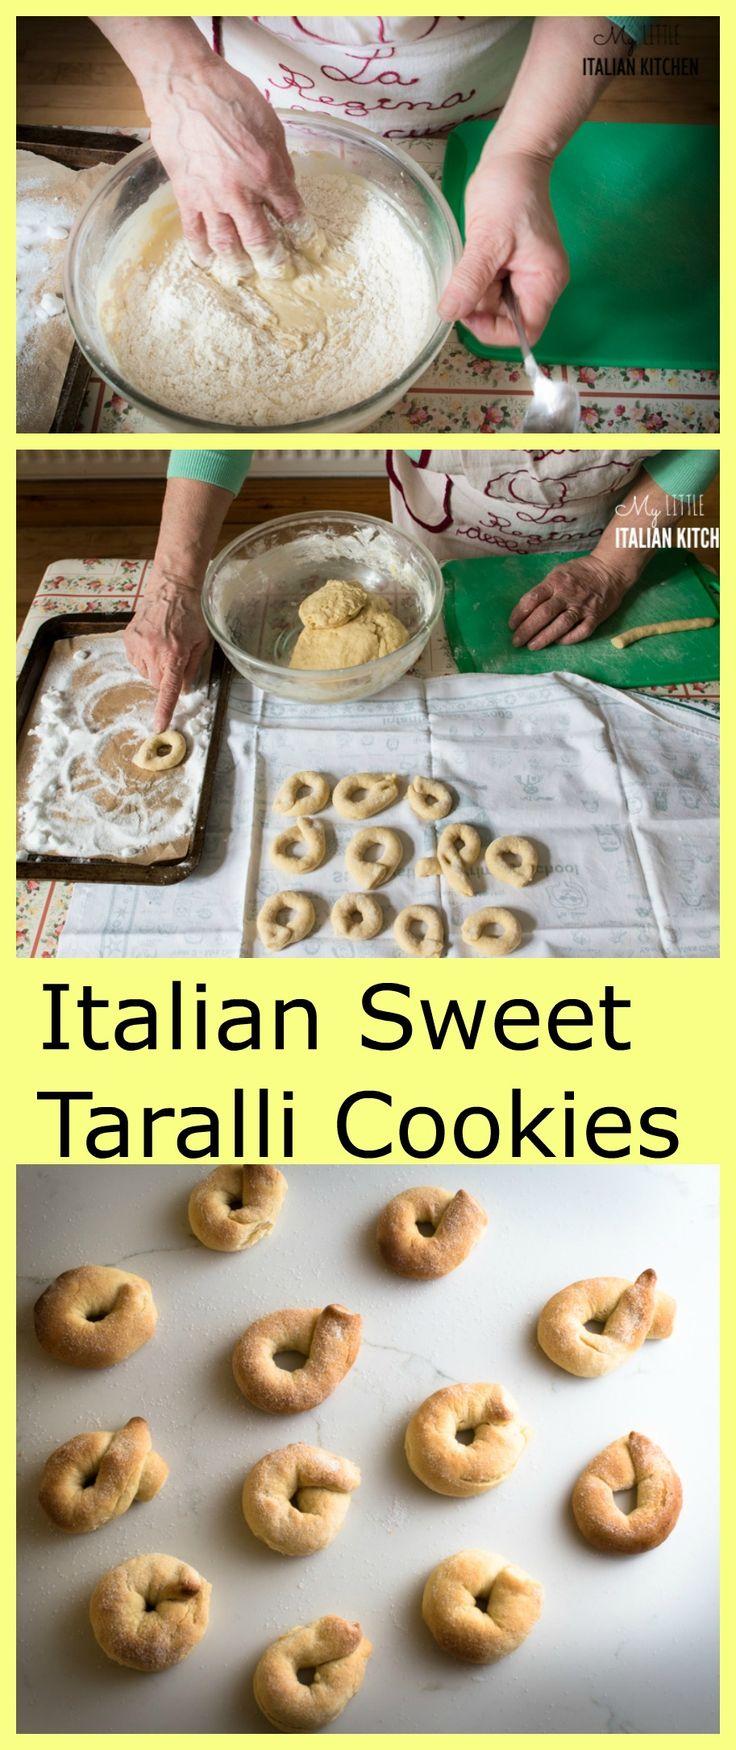 Italian sweet taralli cookies with wine.